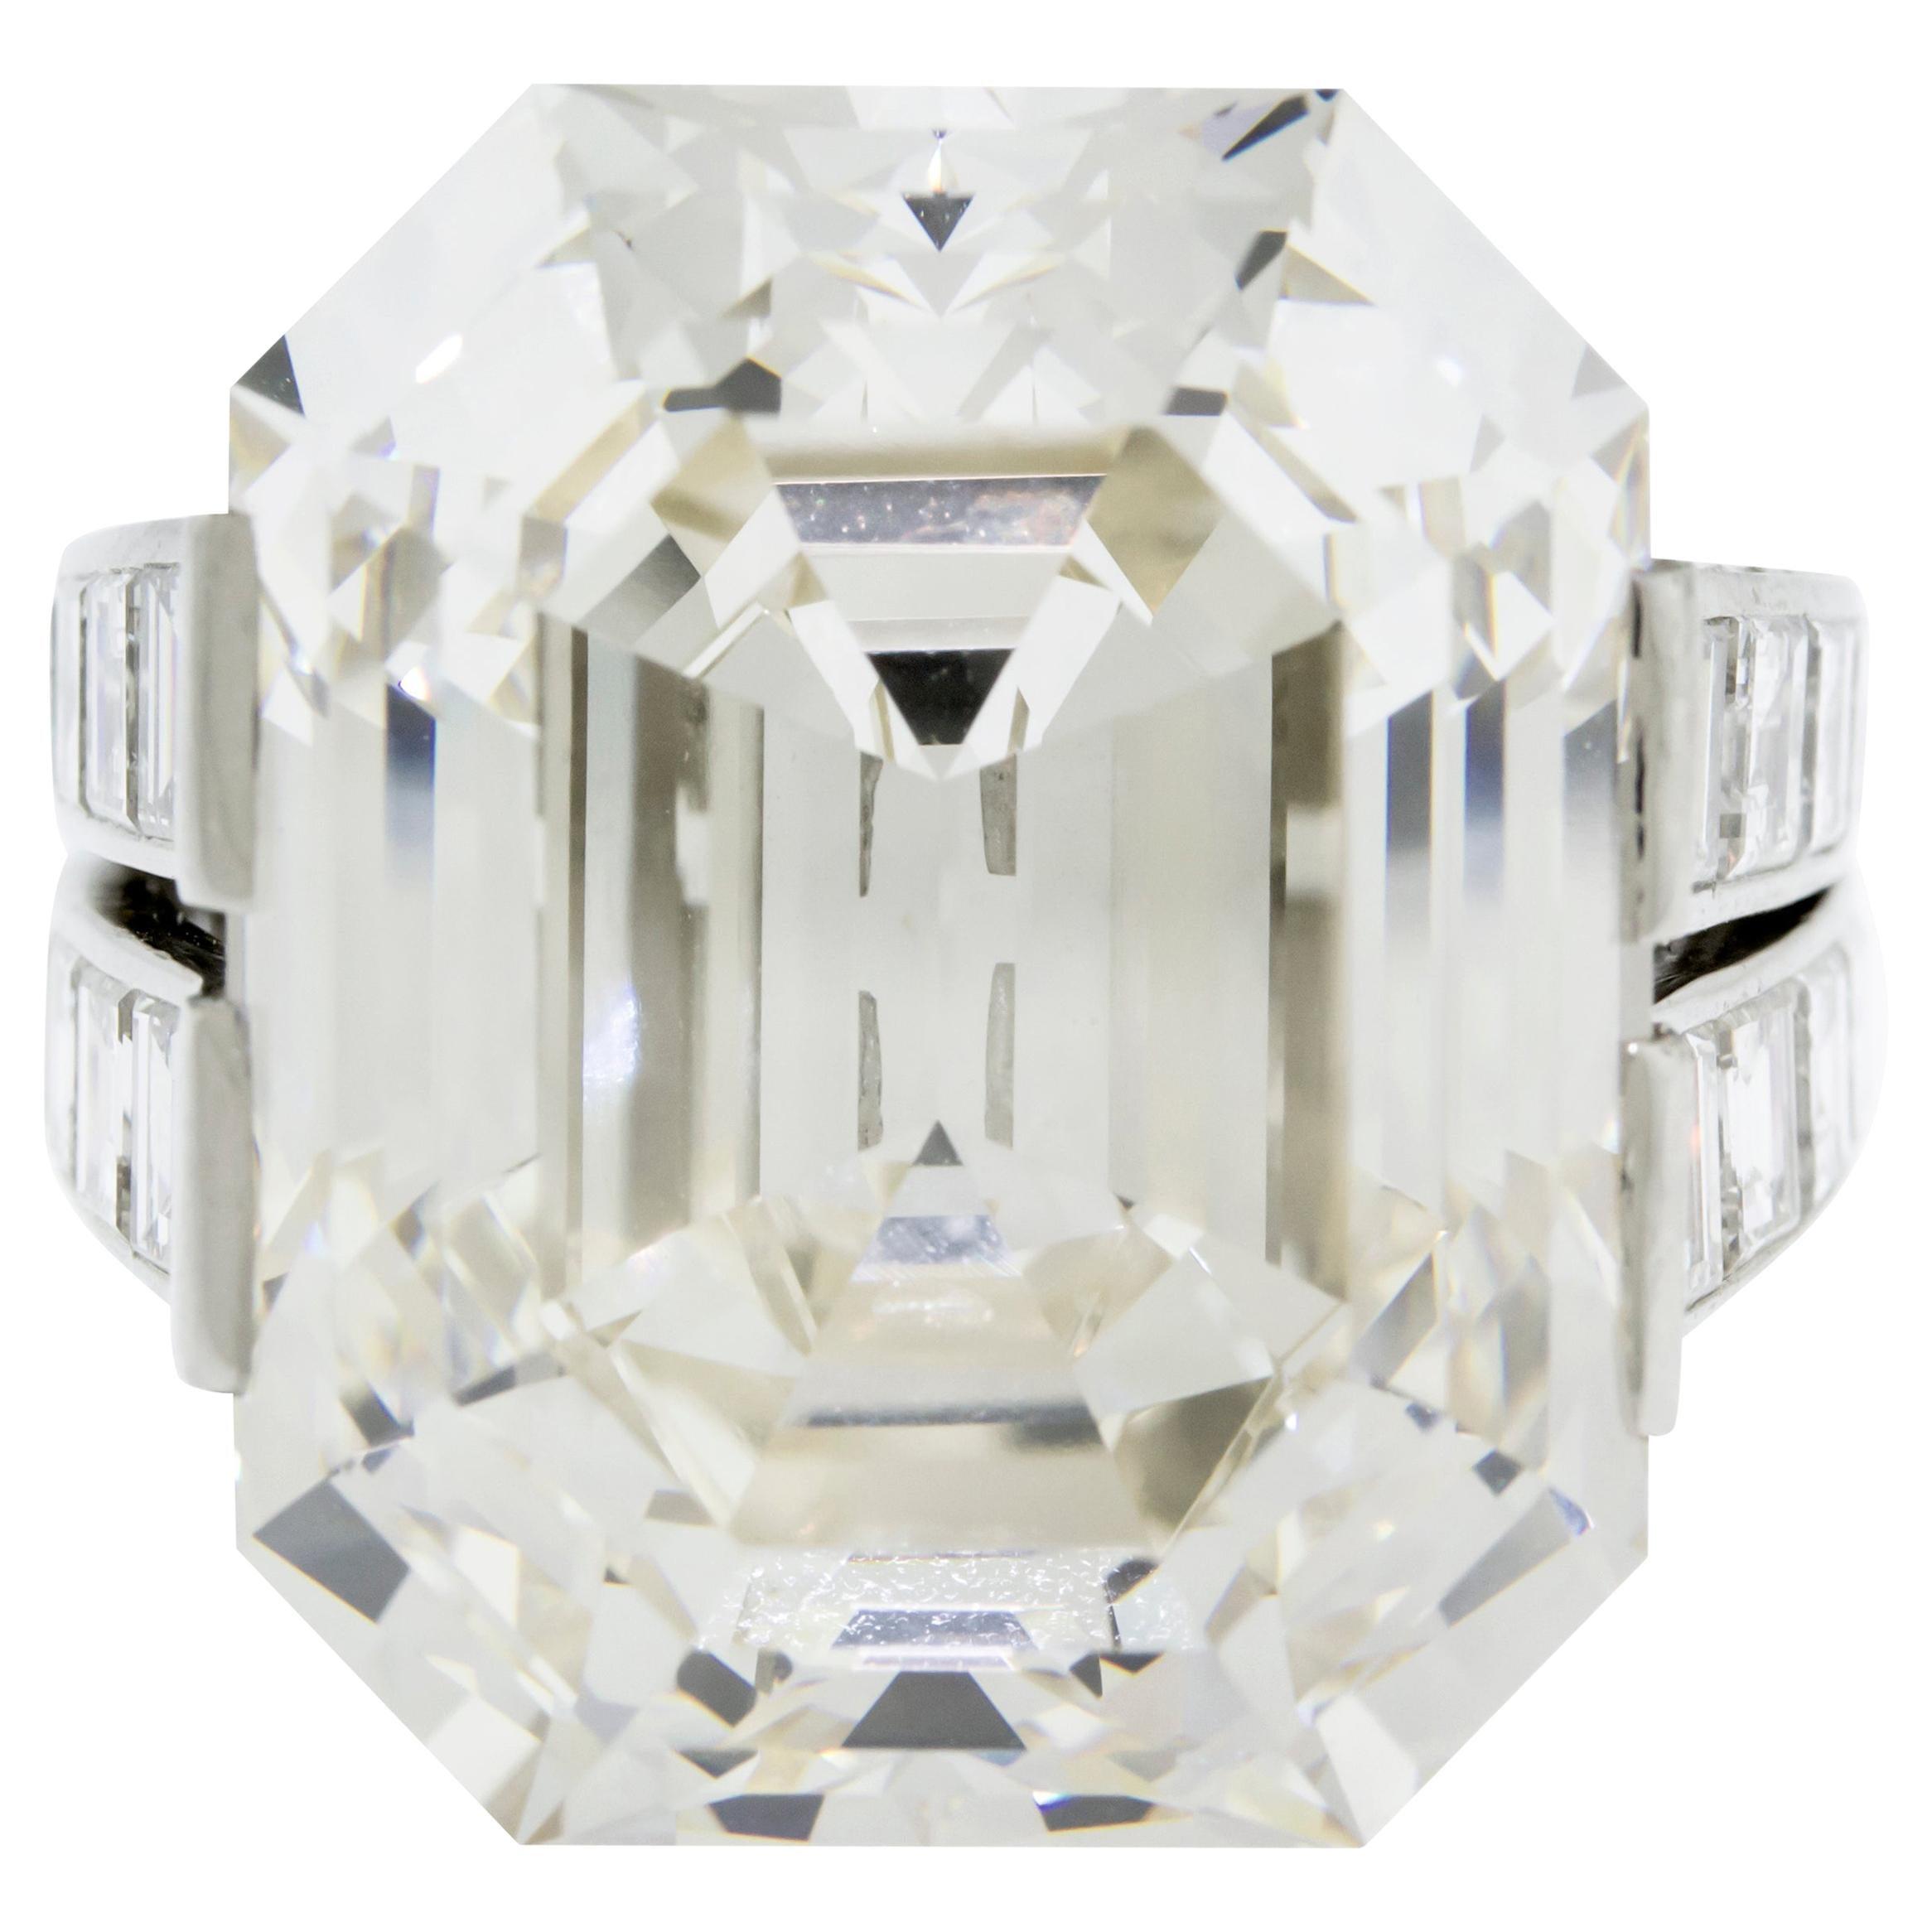 Cartier Monture 30.03 Carat GIA Certified Emerald Cut Diamond Engagement Ring